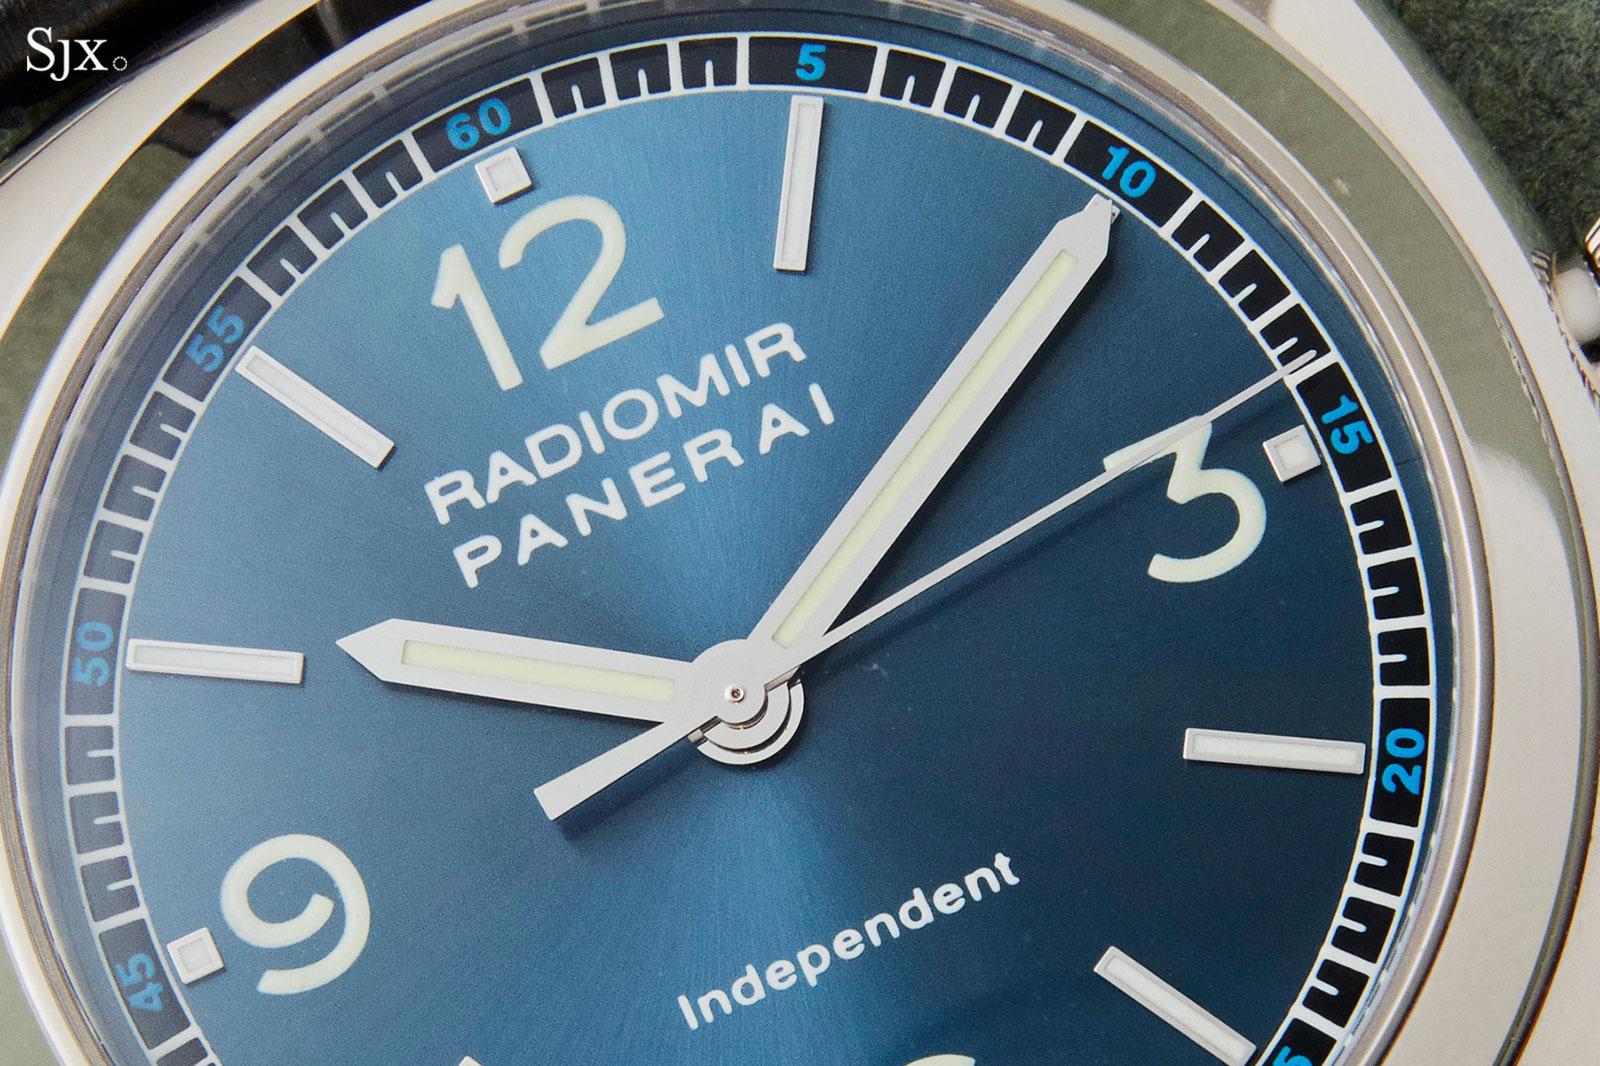 Panerai Radiomir Independent PAM 80 1